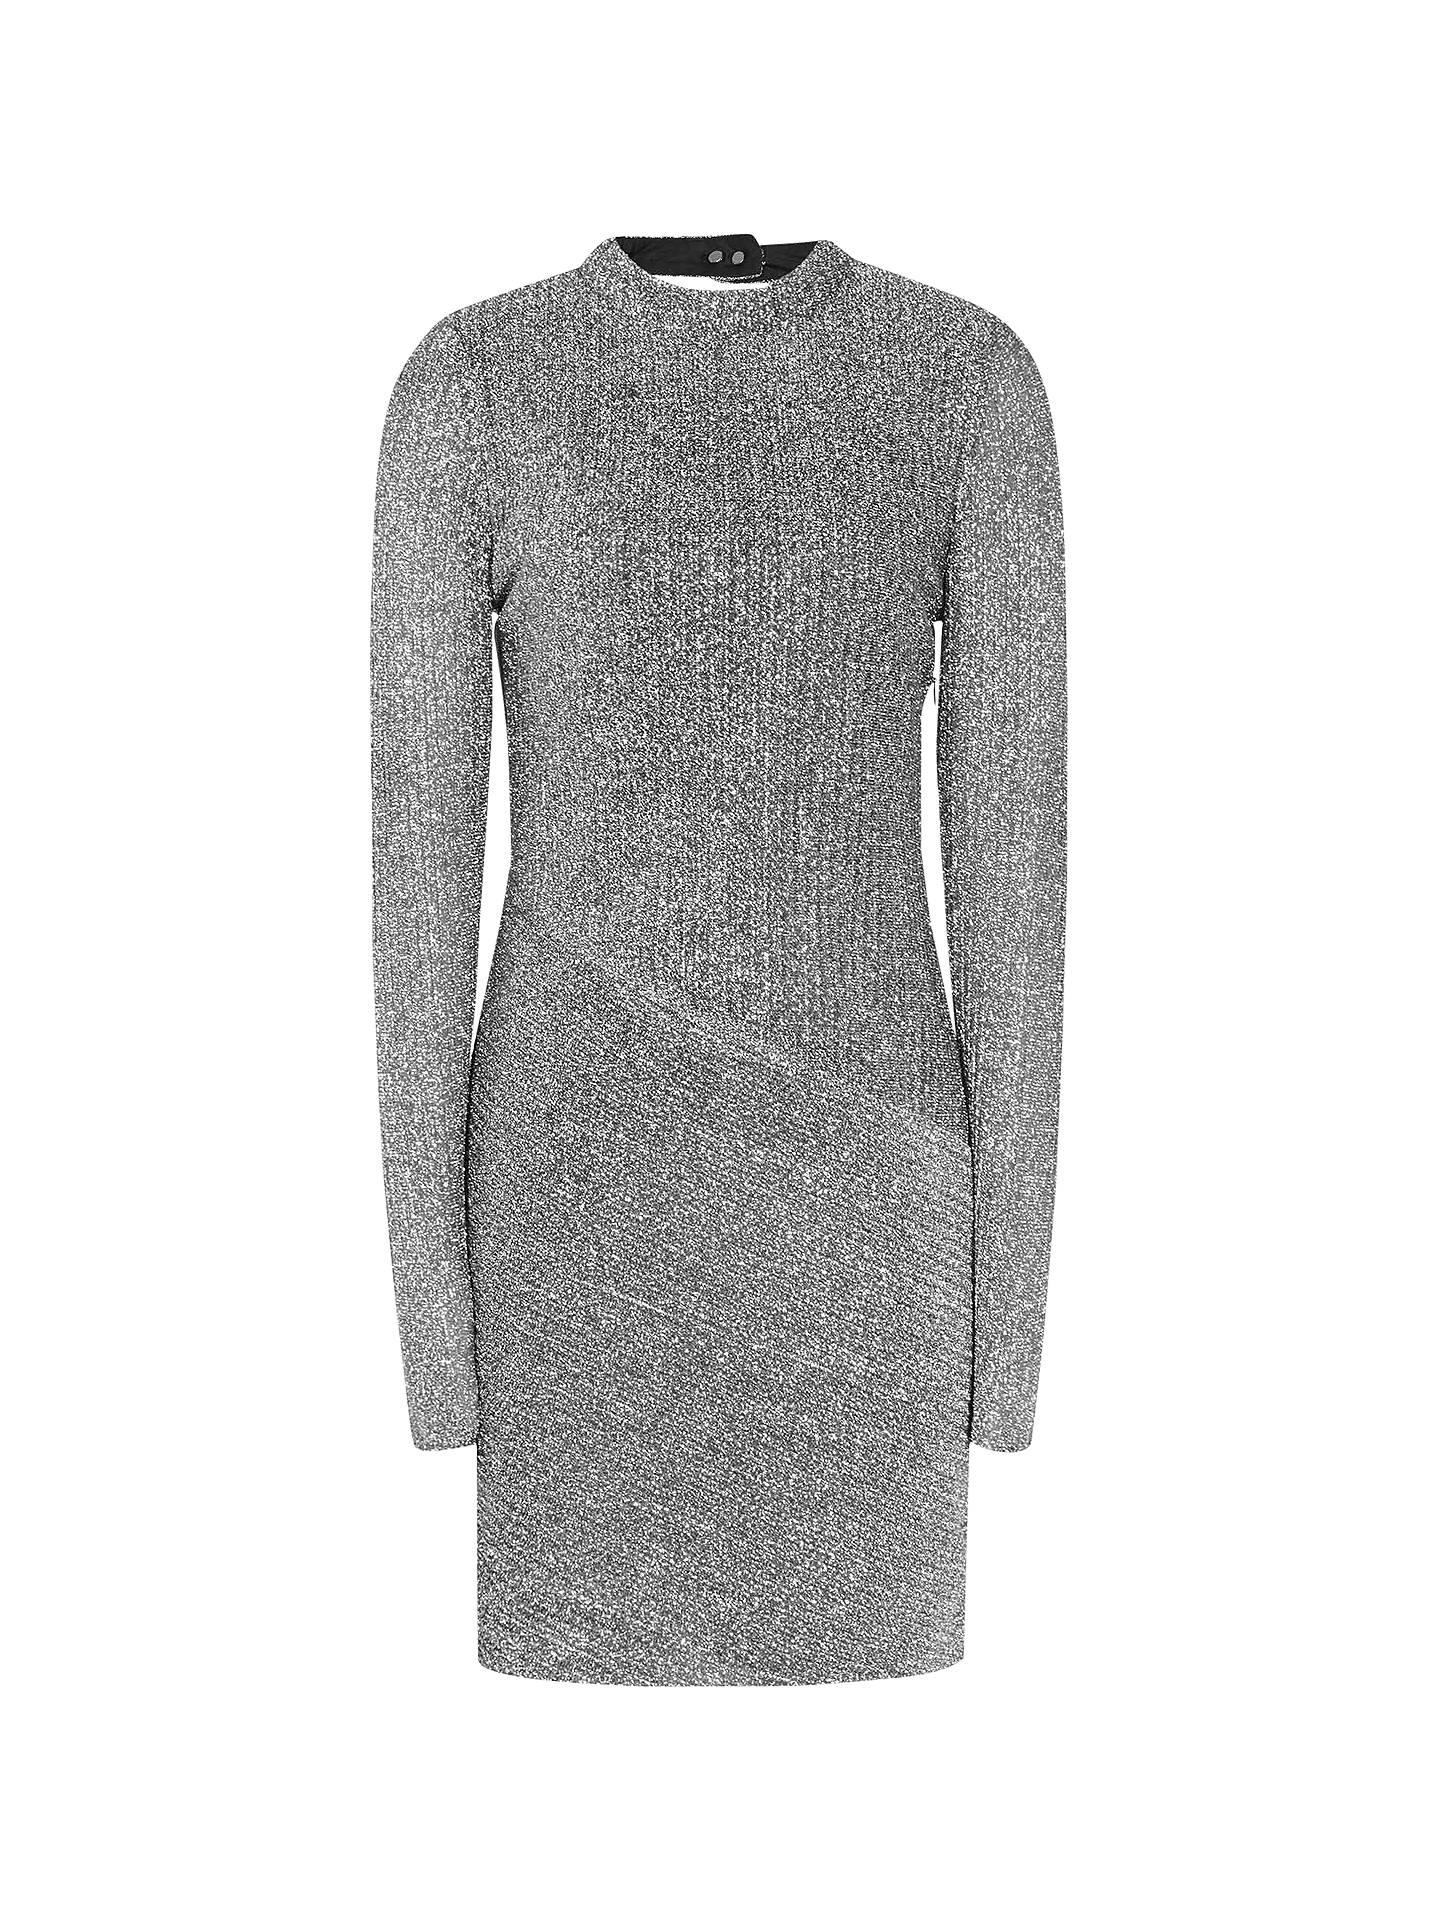 1ff7c4c3c883 Buy Reiss Candy Metallic Bodycon Dress, Silver, 6 Online at johnlewis.com  ...